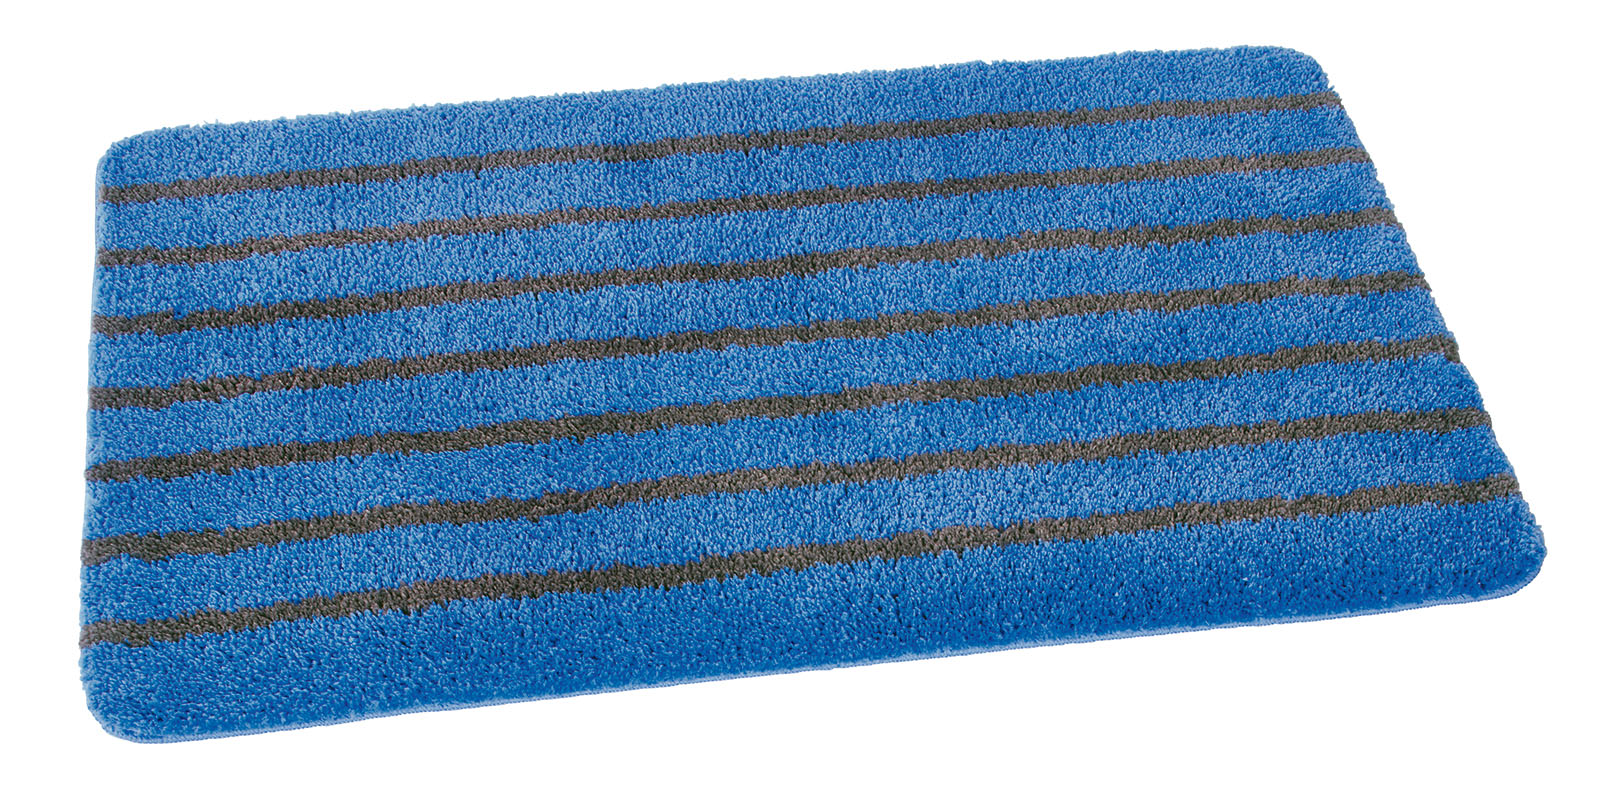 mikrofaser badteppich 60x100cm blau grau gestreift ean794. Black Bedroom Furniture Sets. Home Design Ideas